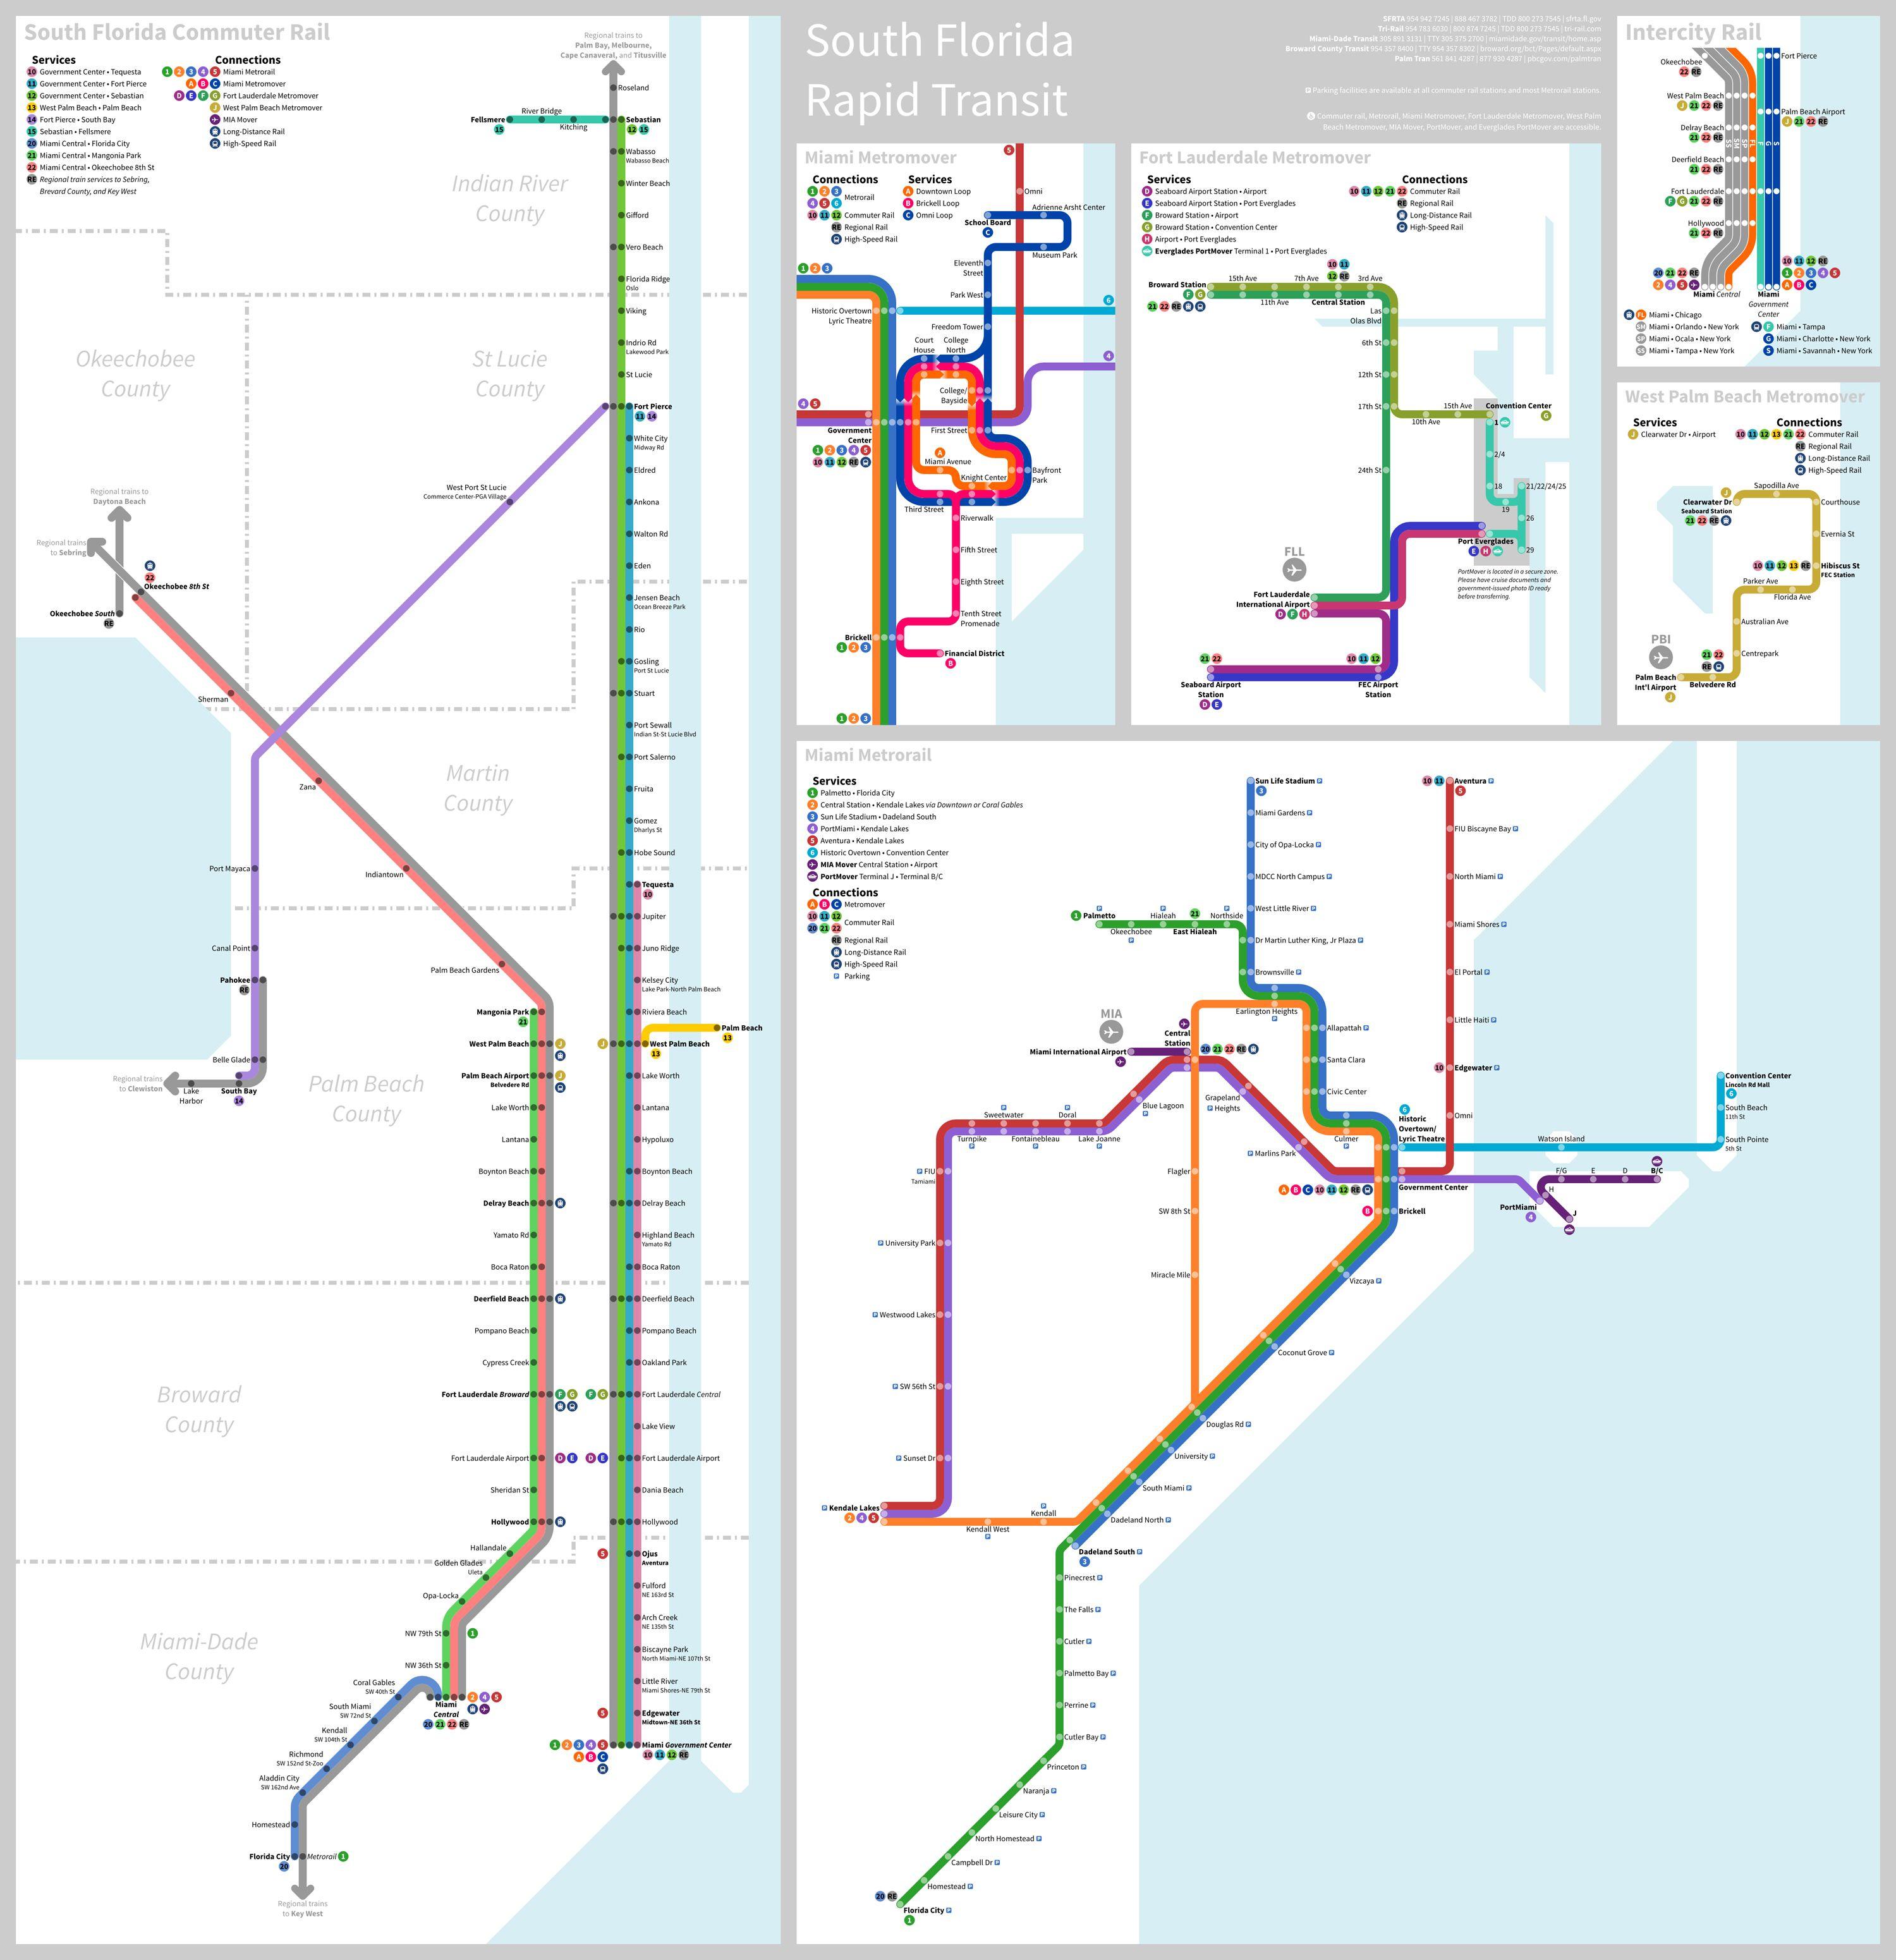 South Florida Rapid Transit Vision Miami Fantasy Subway Rapid